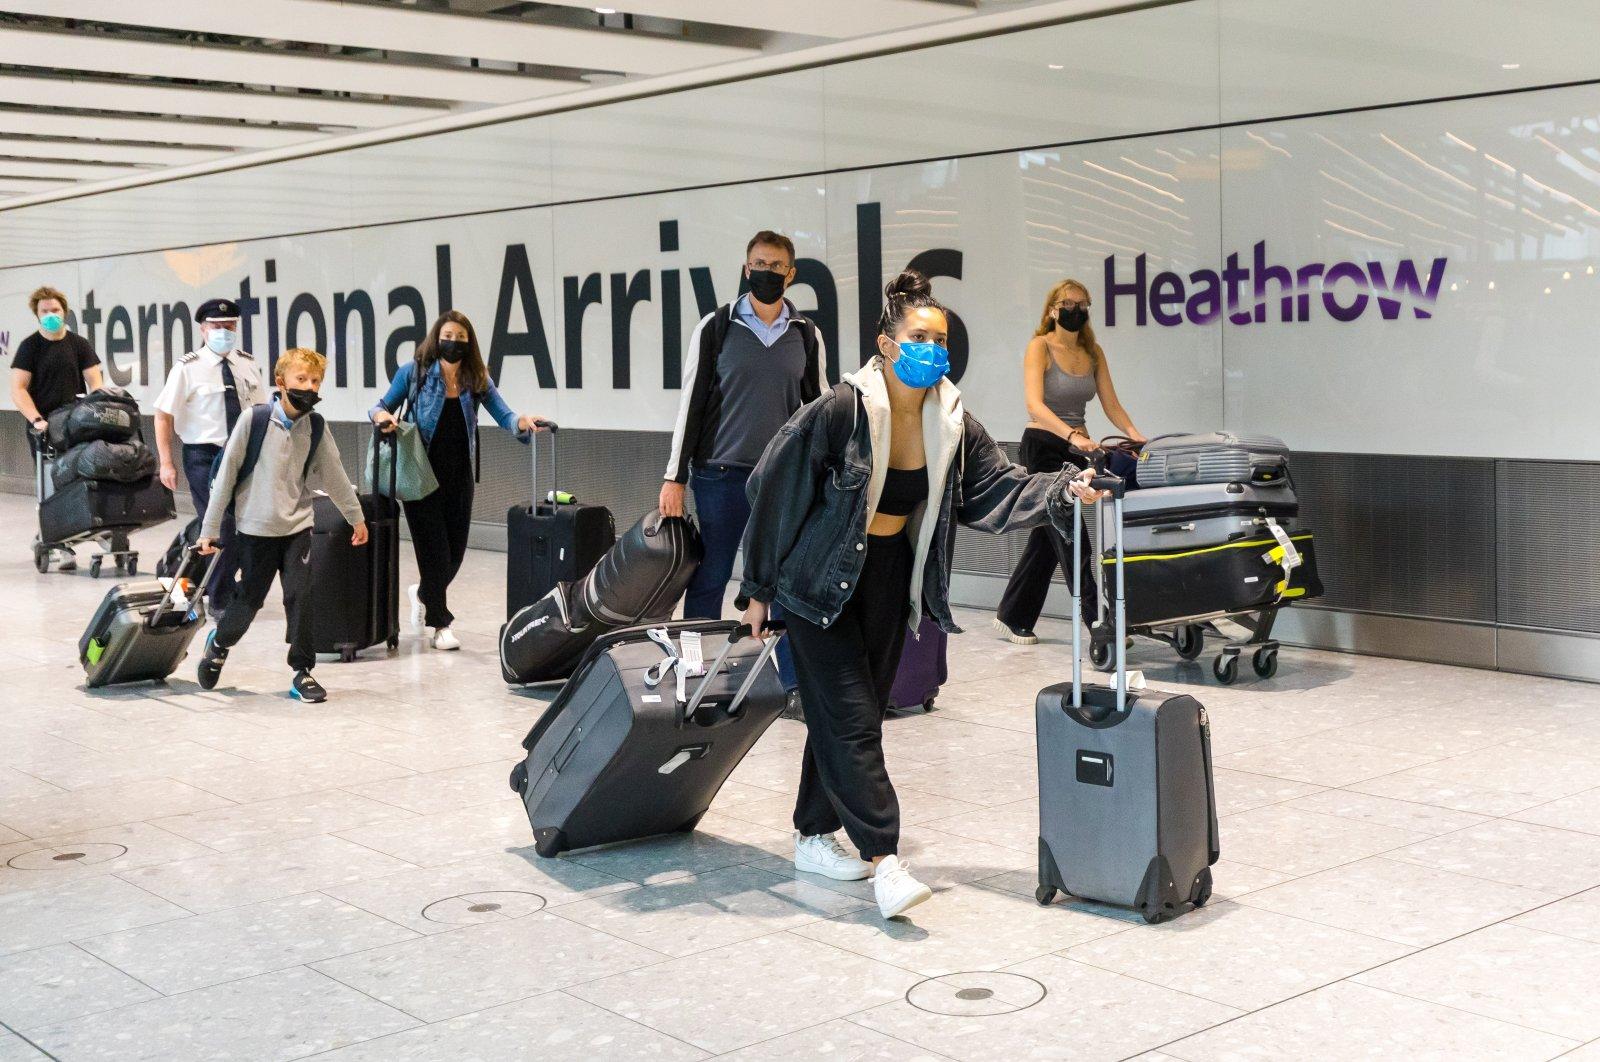 Passengers arrive at Heathrow Airport in London, U.K., Aug. 2, 2021. (EPA Photo)